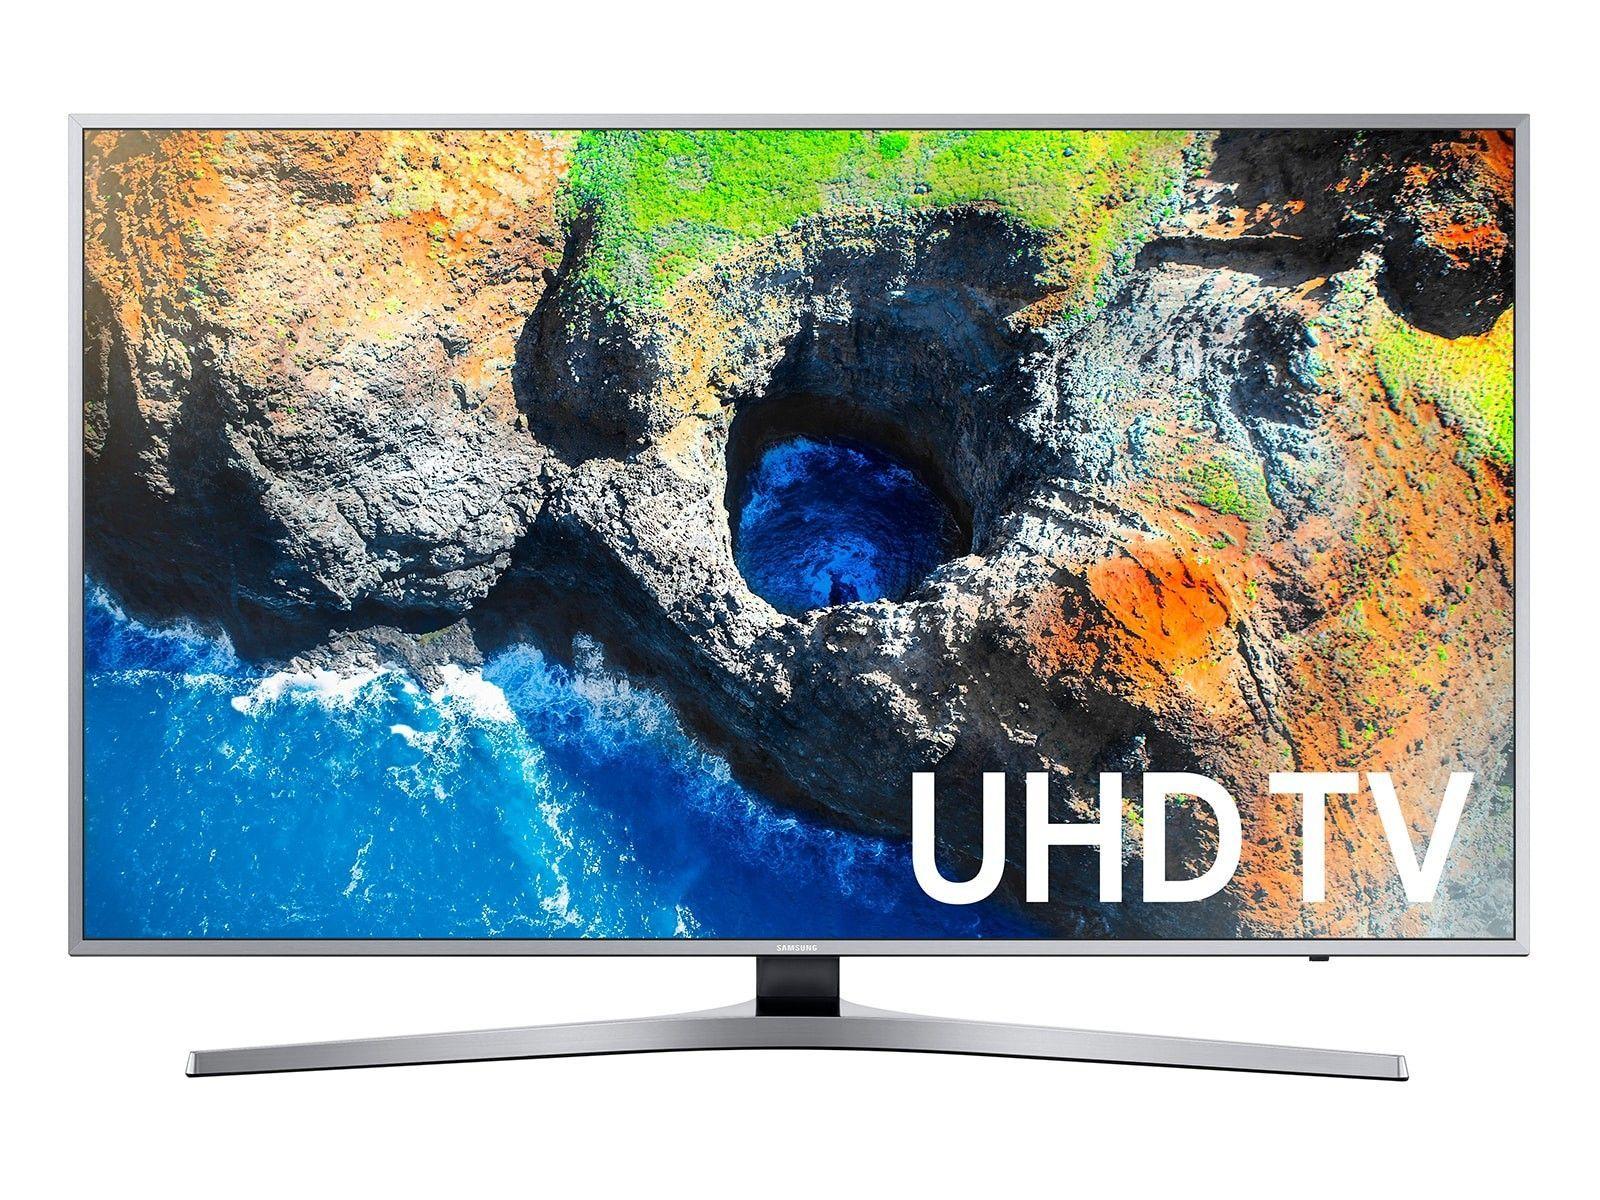 Best Of Samsung 7 Series Tv Wallpaper In 2020 4k Ultra Hd Tvs Uhd Tv Curved Tvs